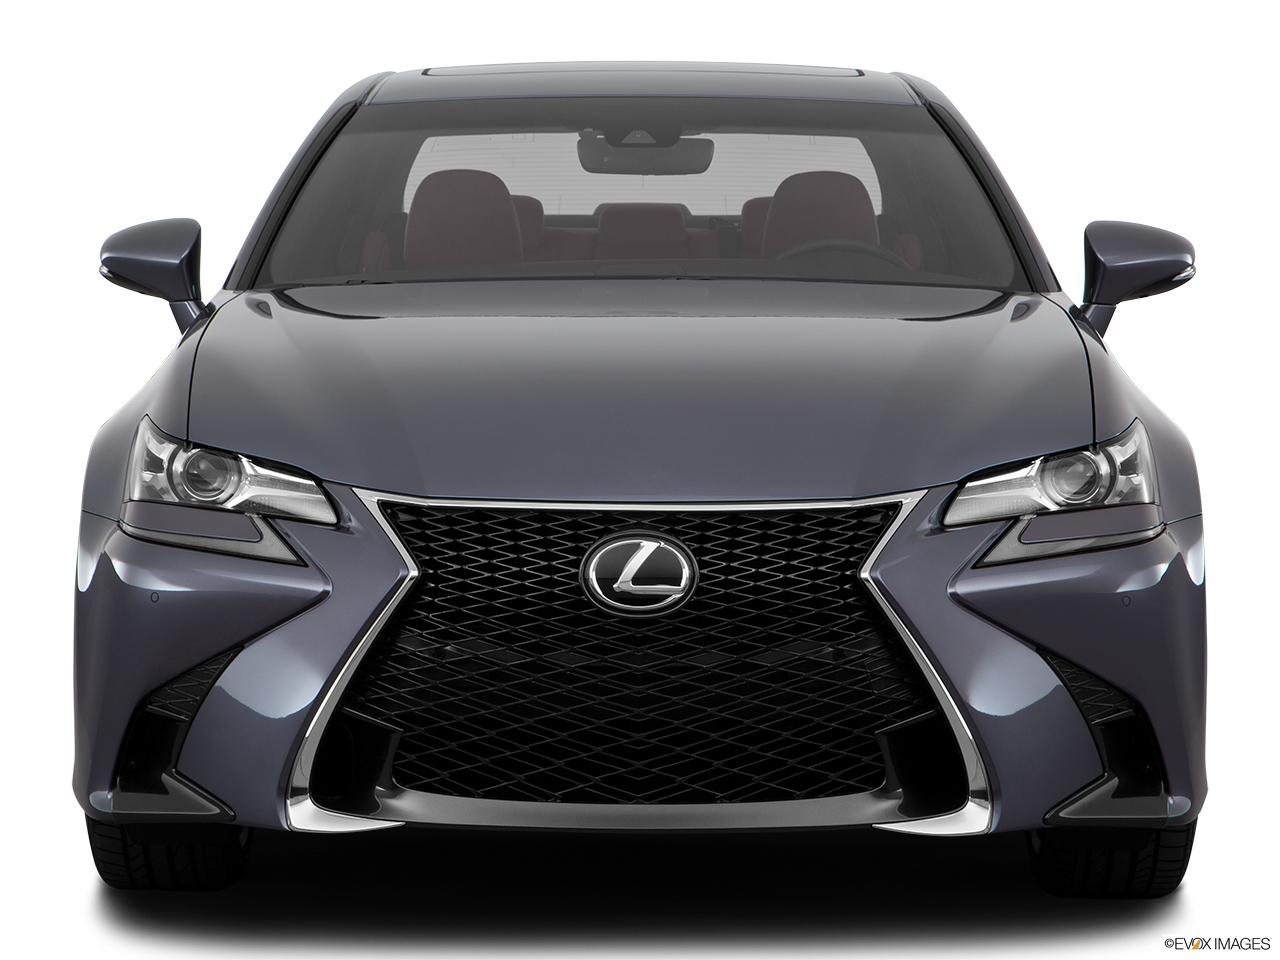 car features list for lexus gs 2016 350 f sport uae. Black Bedroom Furniture Sets. Home Design Ideas